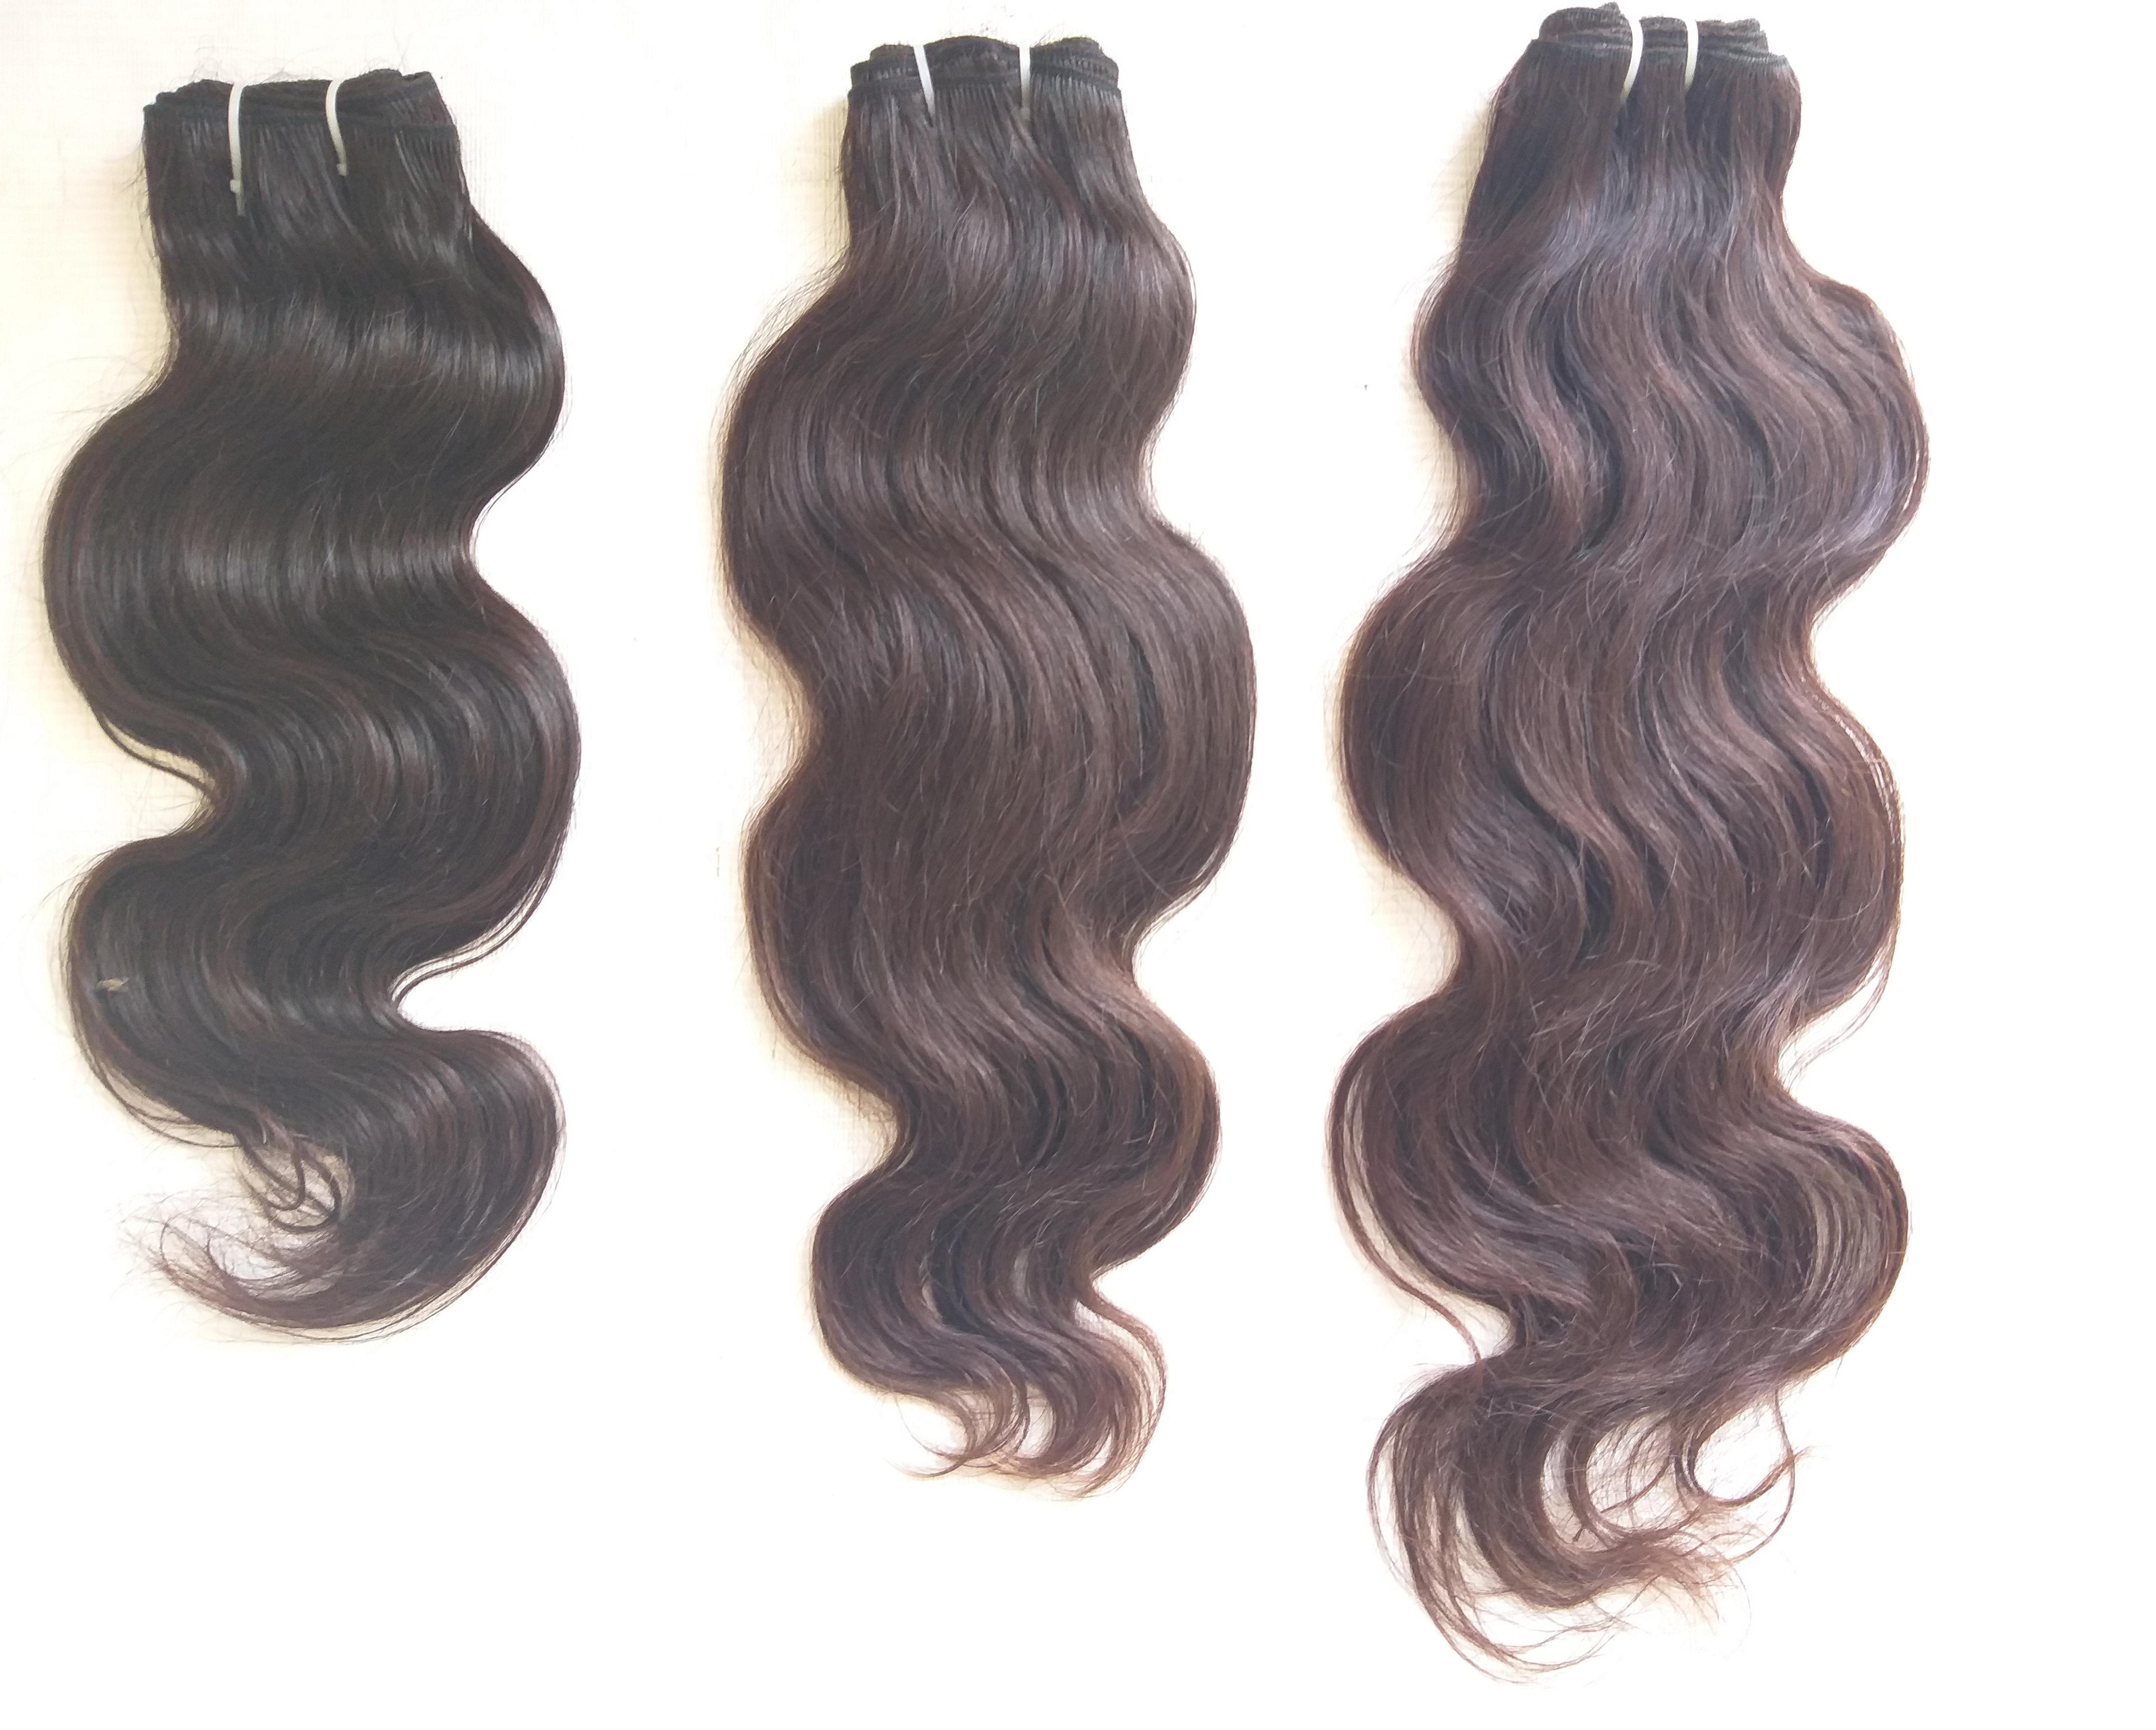 Indian Virgin Body Wave Hair, Wholesale Price Top Quality Virgin Human Hair Body Wave